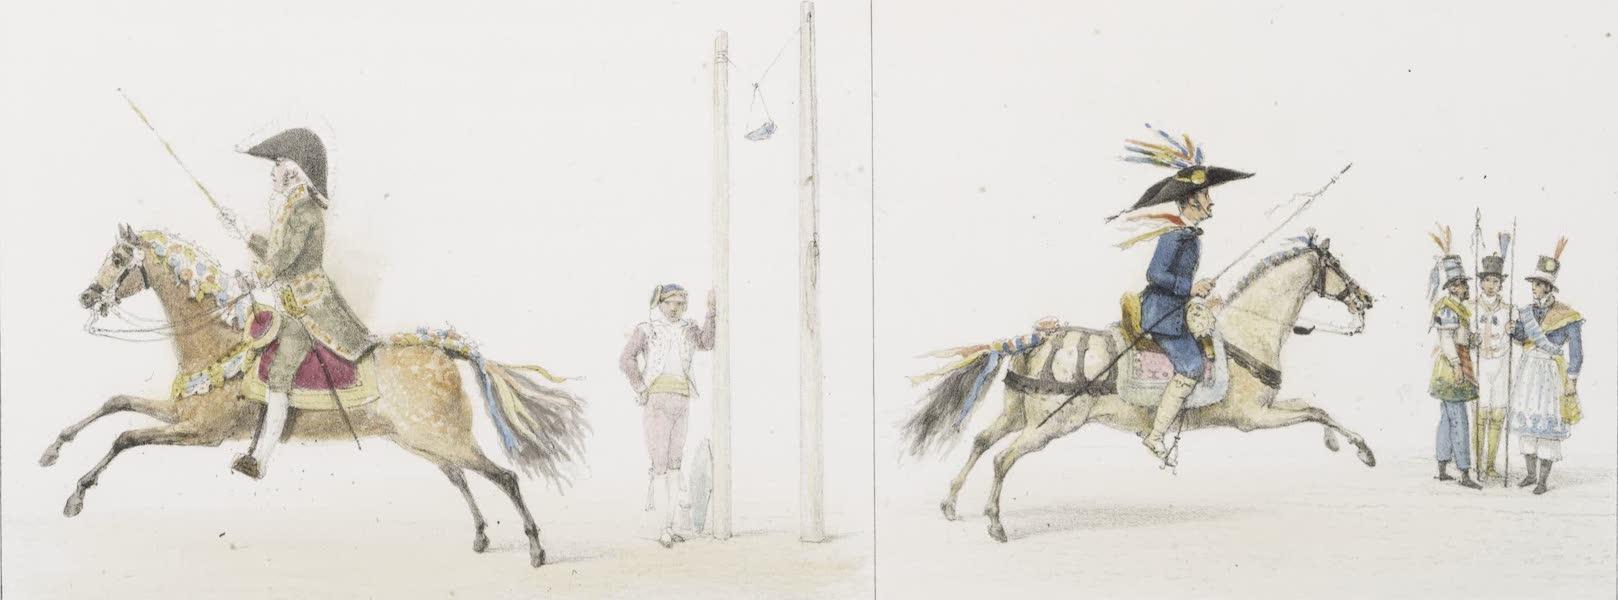 Voyage Pittoresque et Historique au Bresil Vol. 3 - Cavahadas (Tournois) (1839)